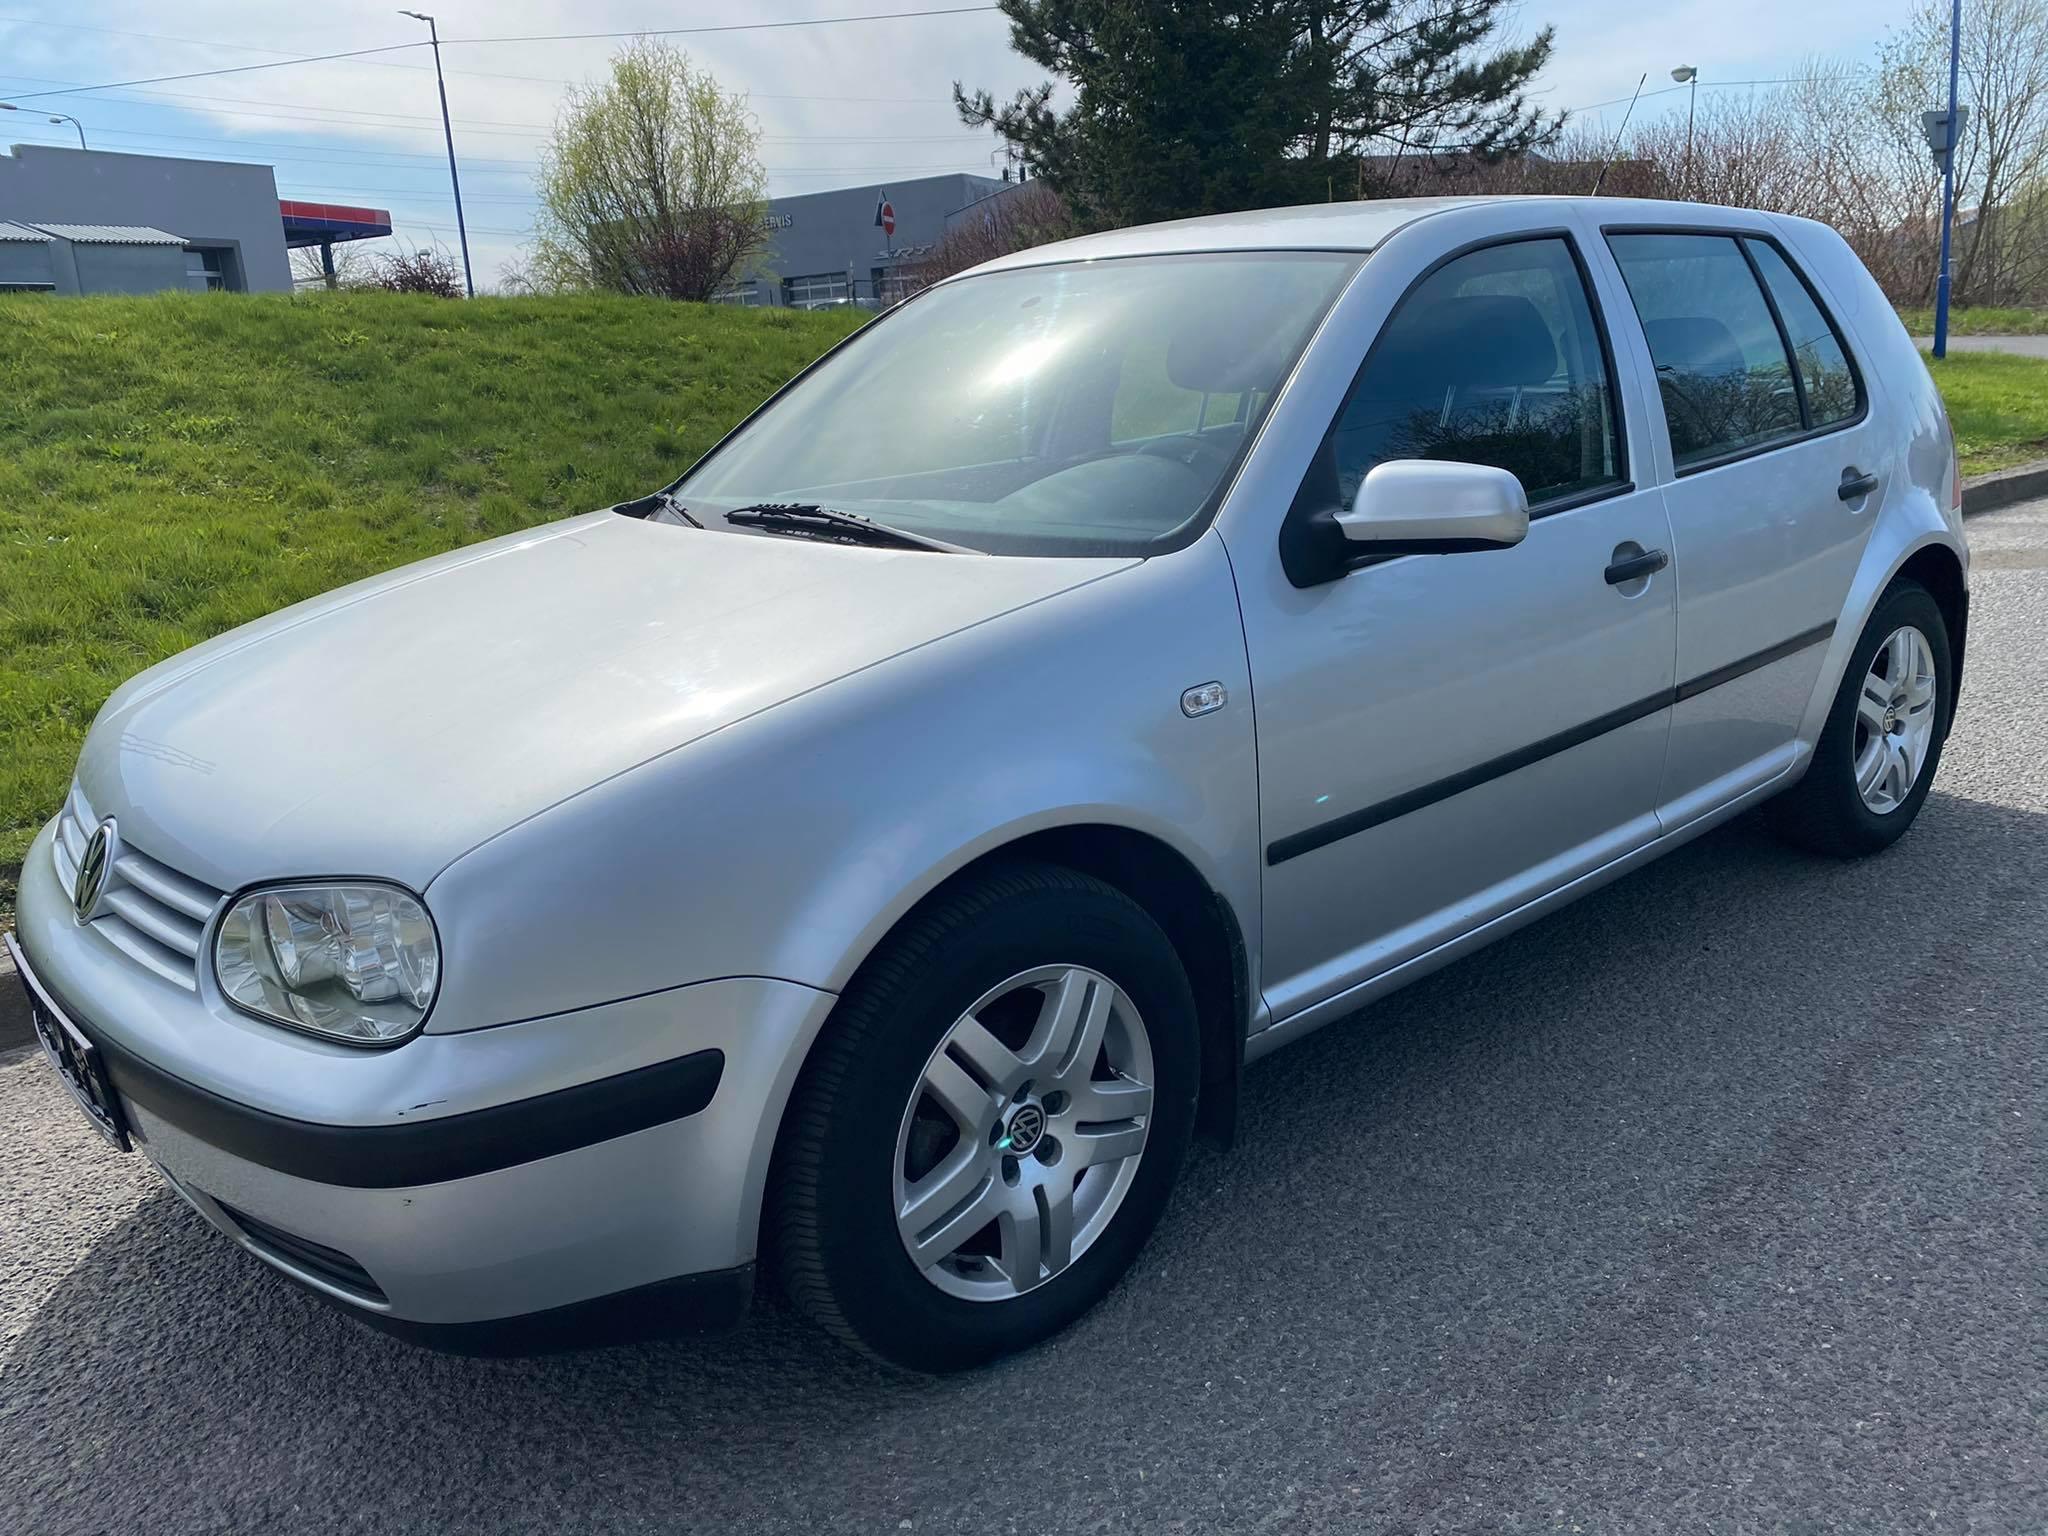 VW Golf 1,4i -klima,webasto,pěkný